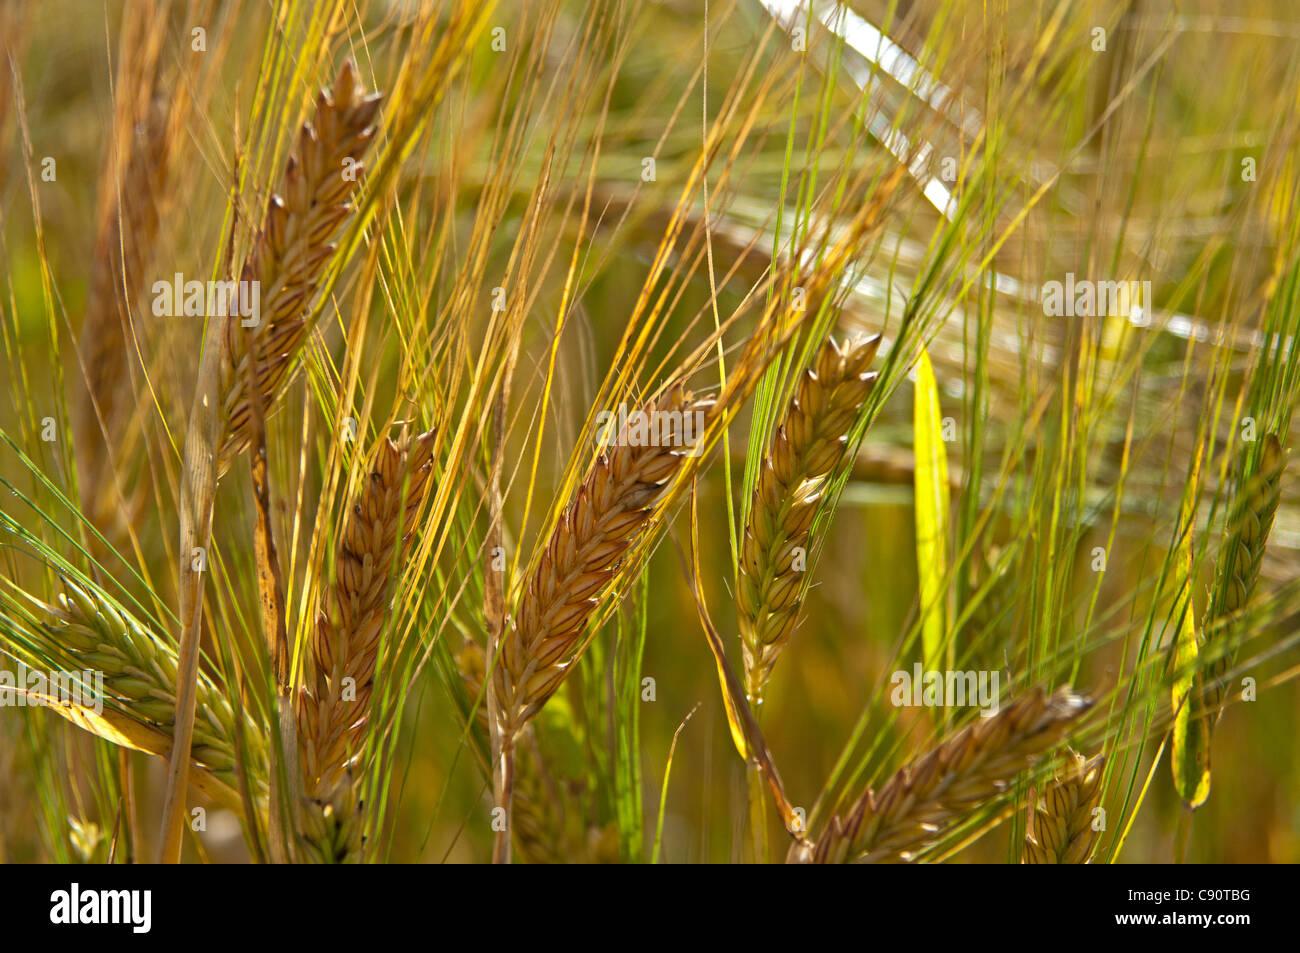 Campo de cebada cerca de Huntley, aberdeenshire, Escocia Imagen De Stock